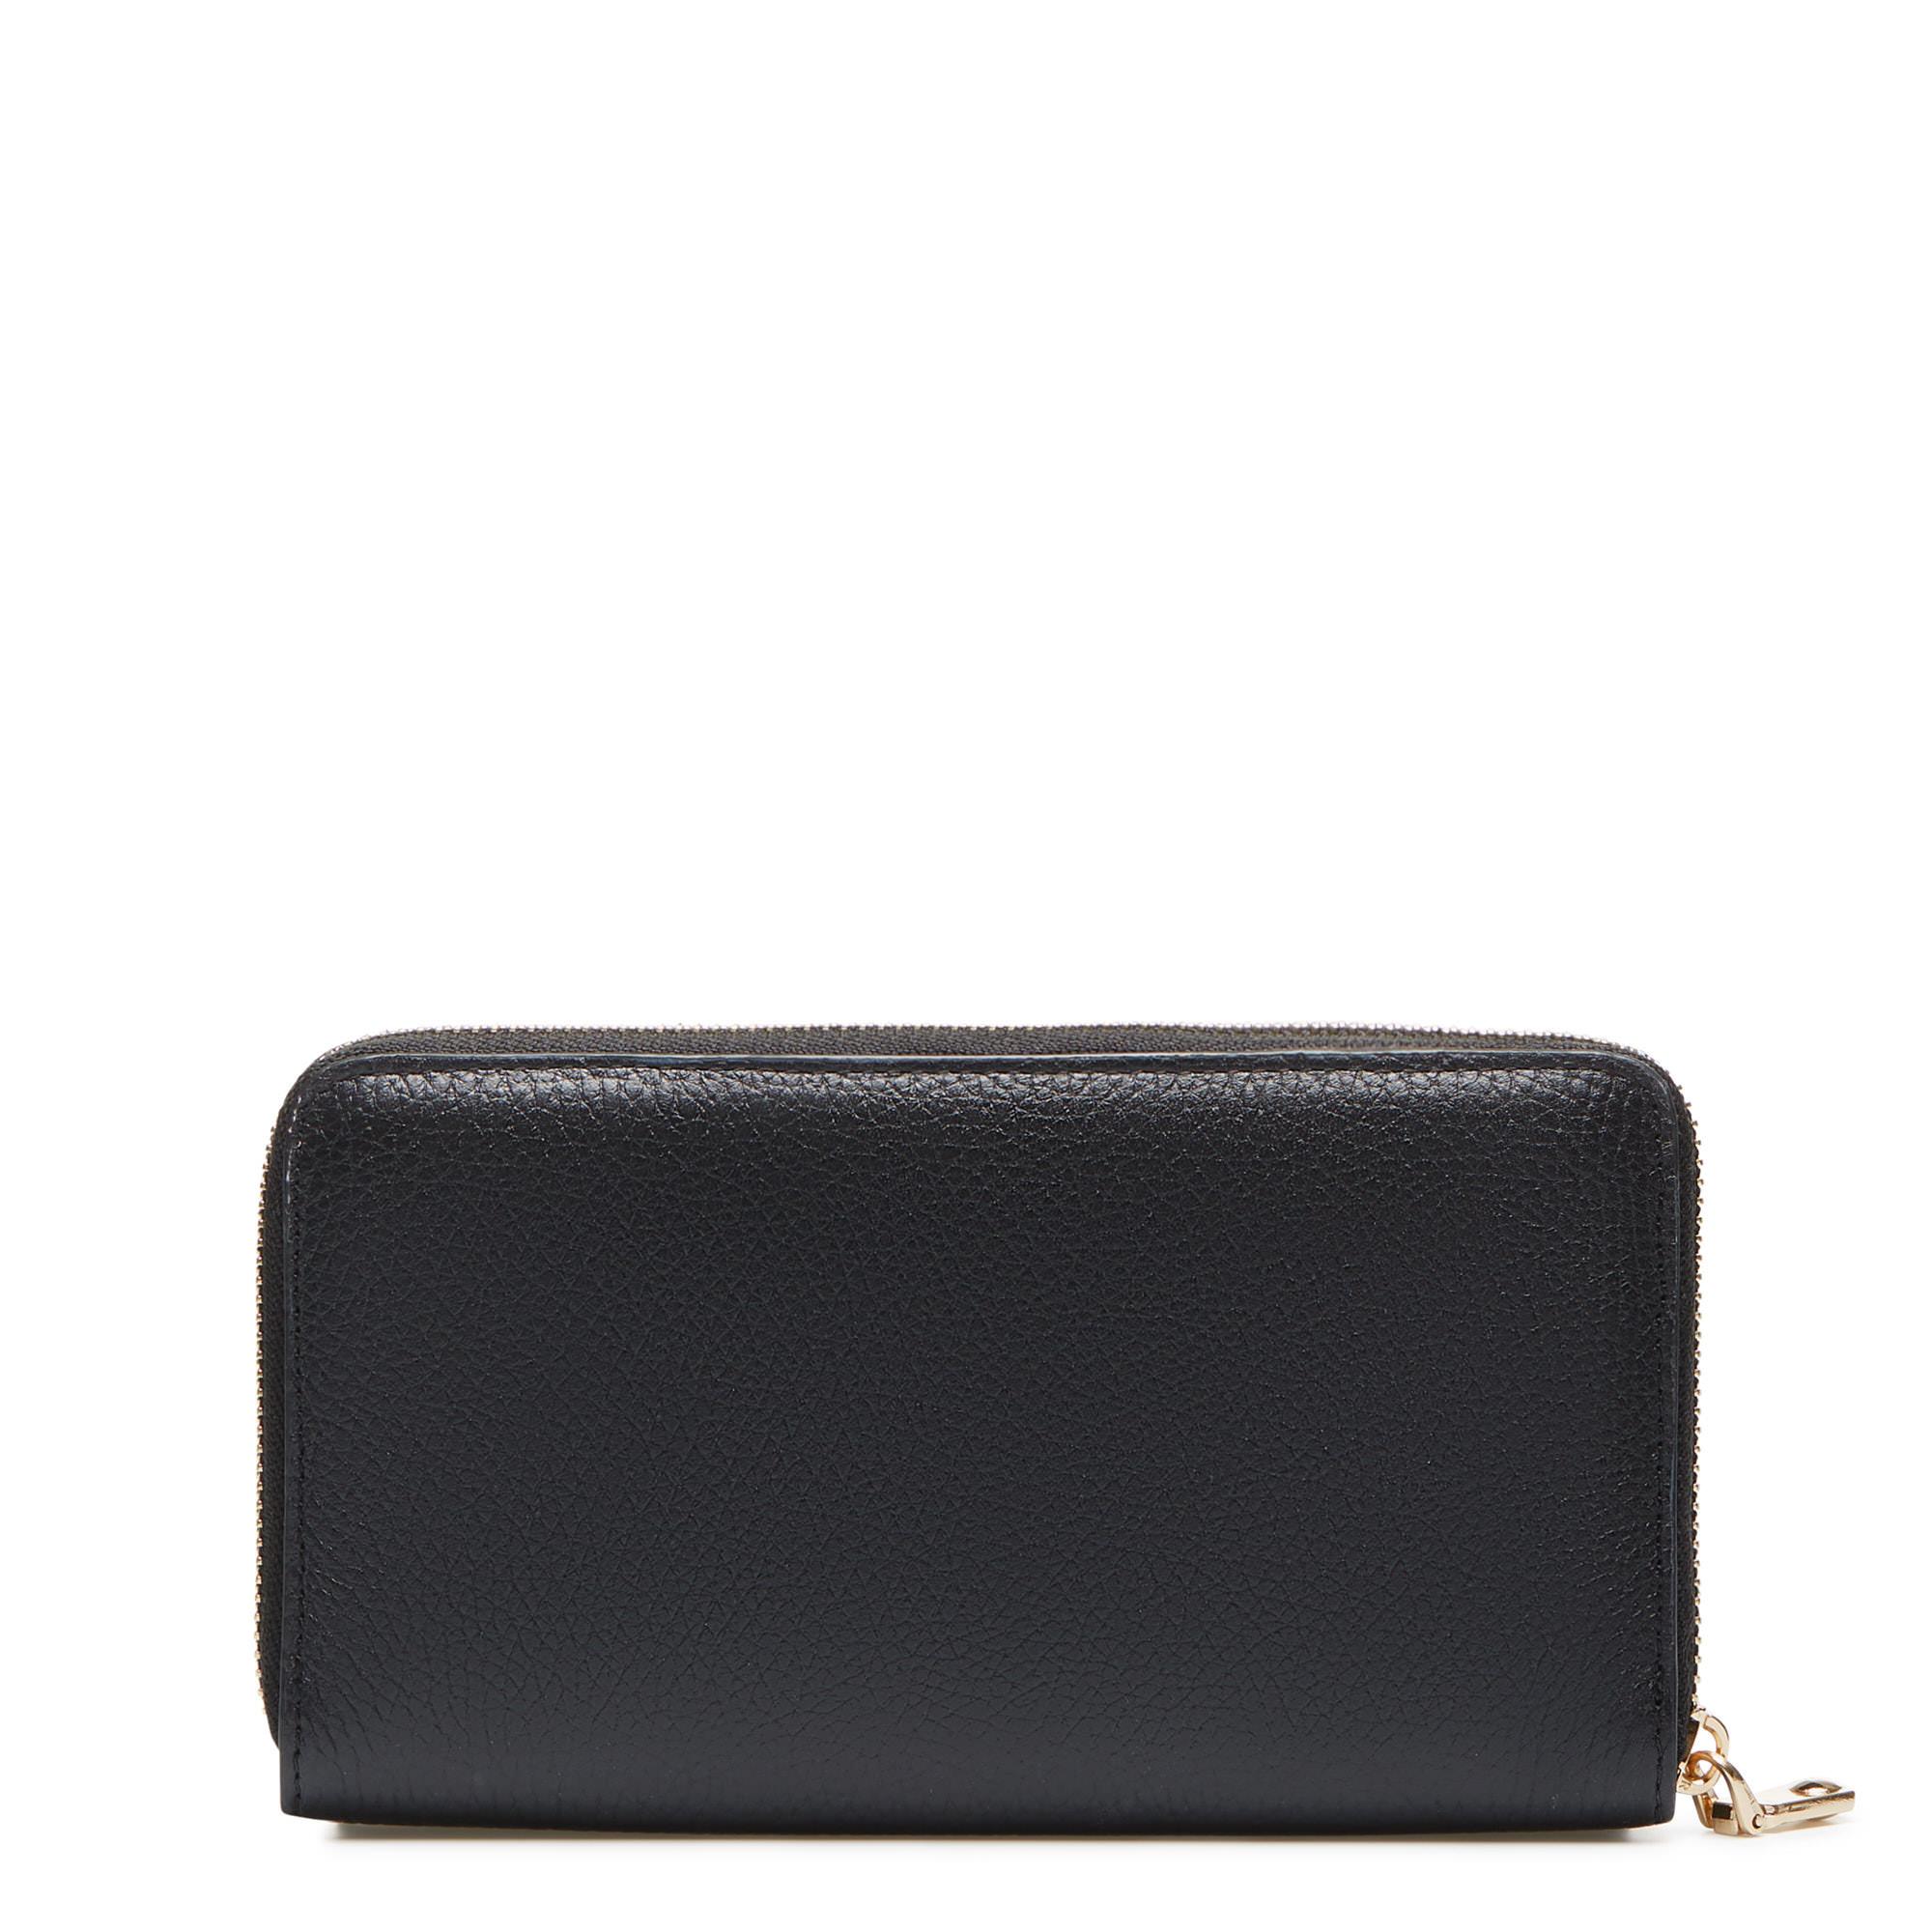 Isabel Bernard Honoré Léa svart läder plånbok med dragkedja av kalvskinn